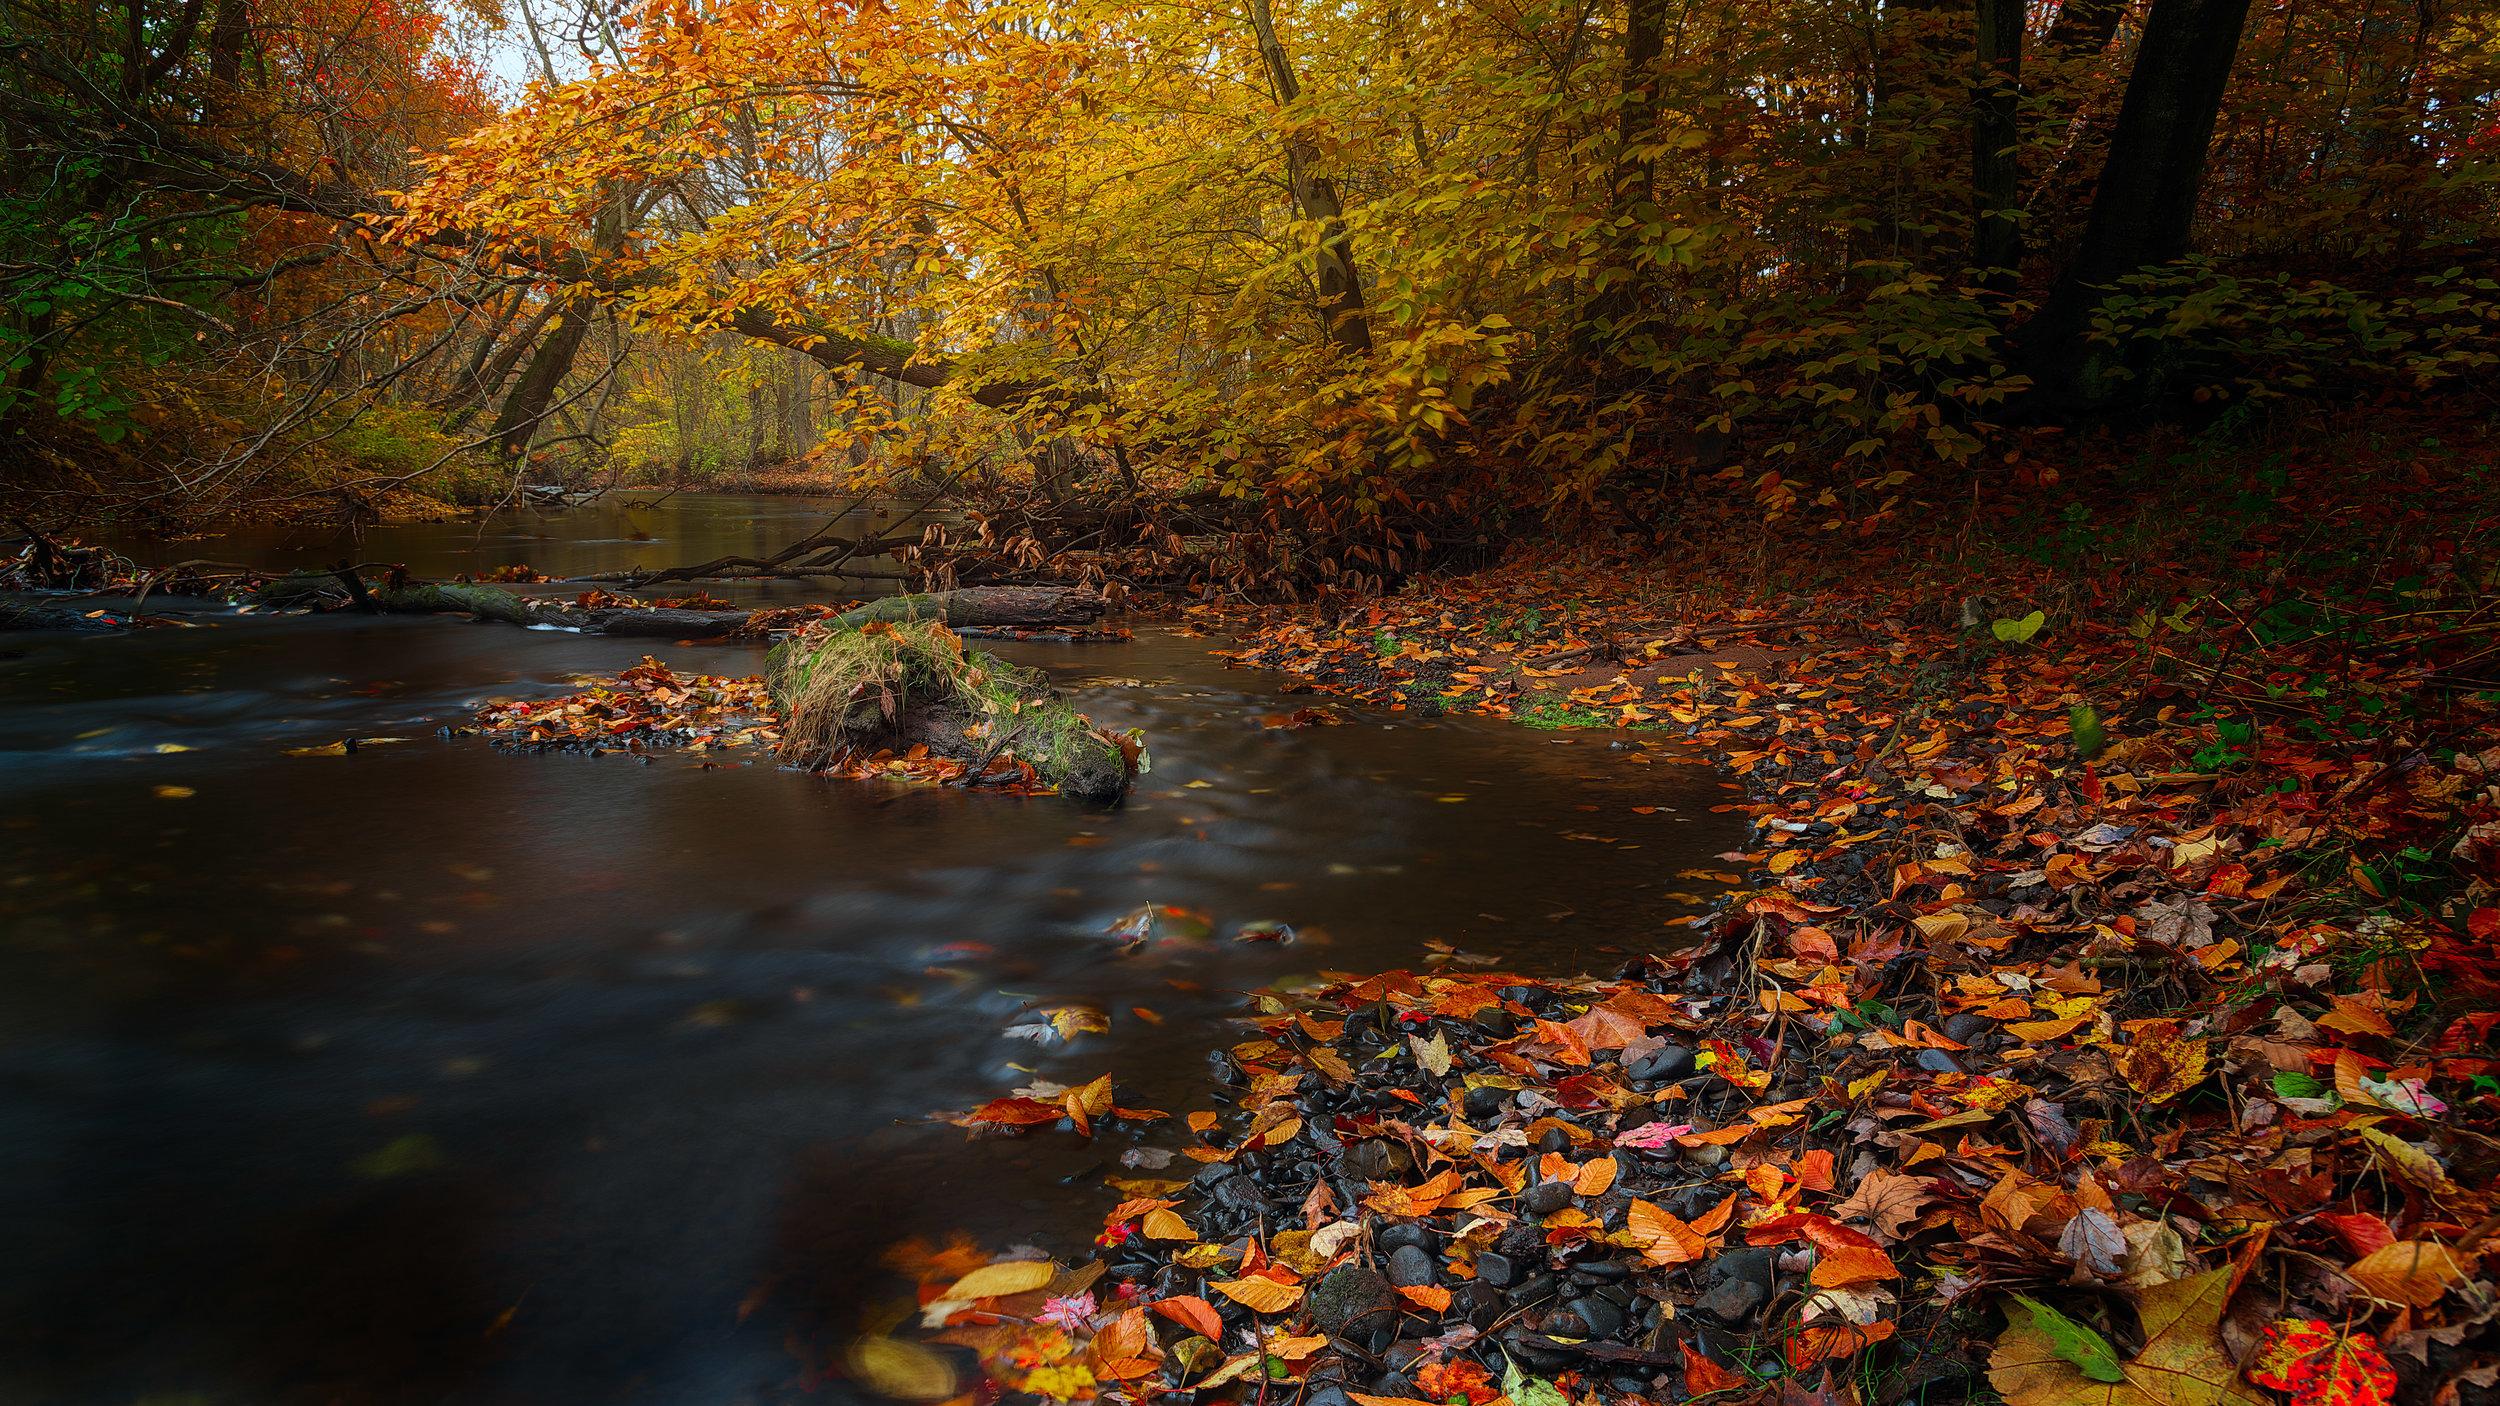 Autumn Journey No. 5